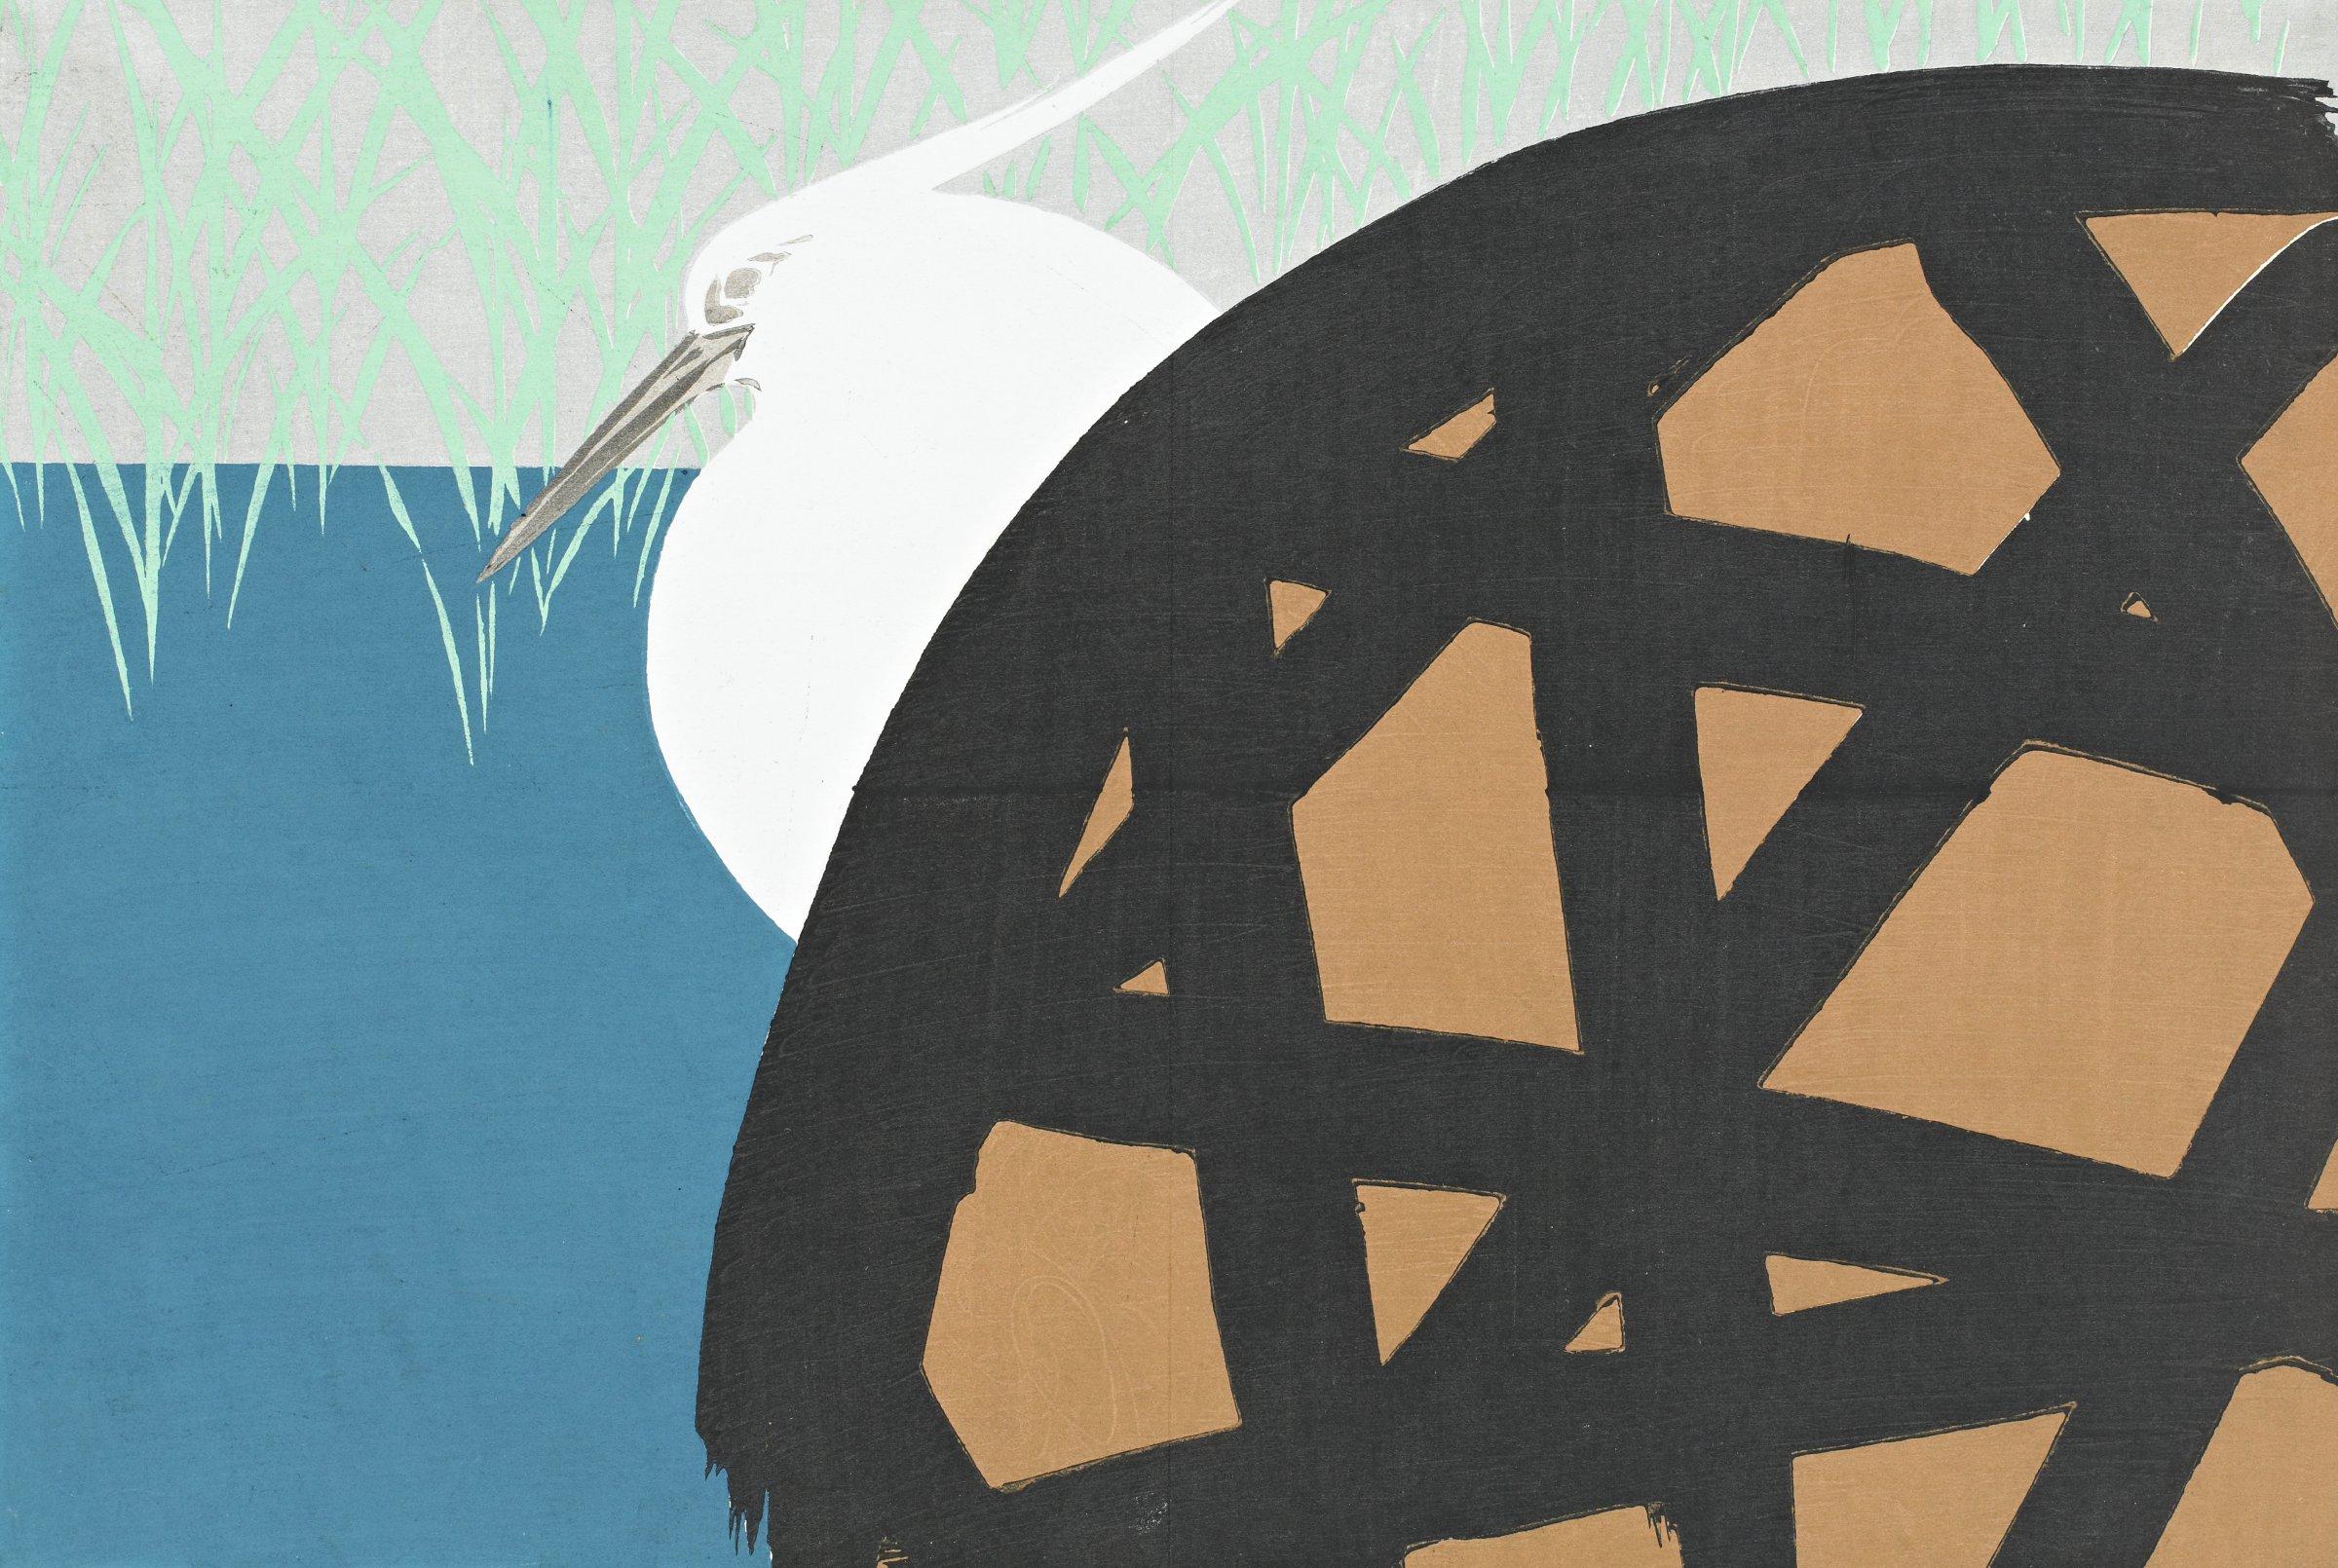 Shirasagi (White Egret), from Momoyogusa (A World of Things), Volume 1, Kamisaka Sekka, ink and color on paper